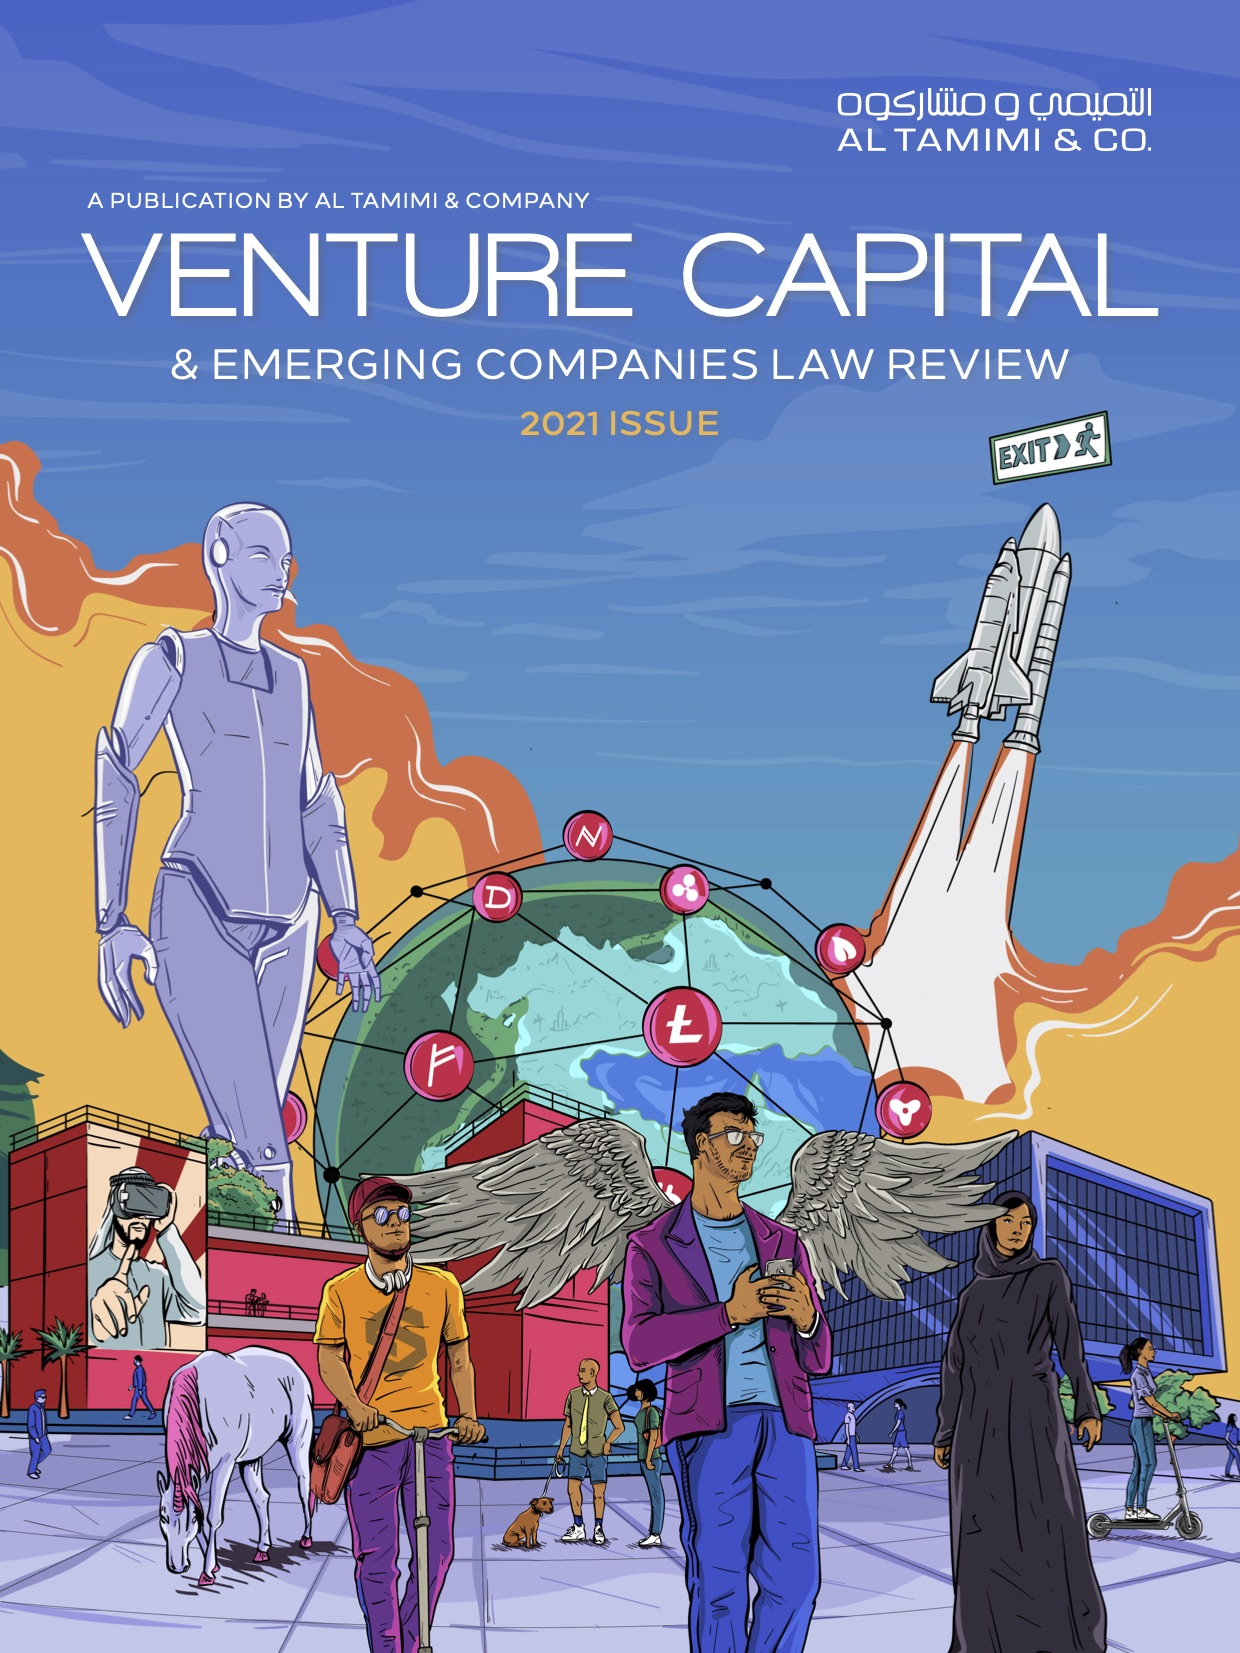 Tamimi Venture Capital Emerging companies Law review